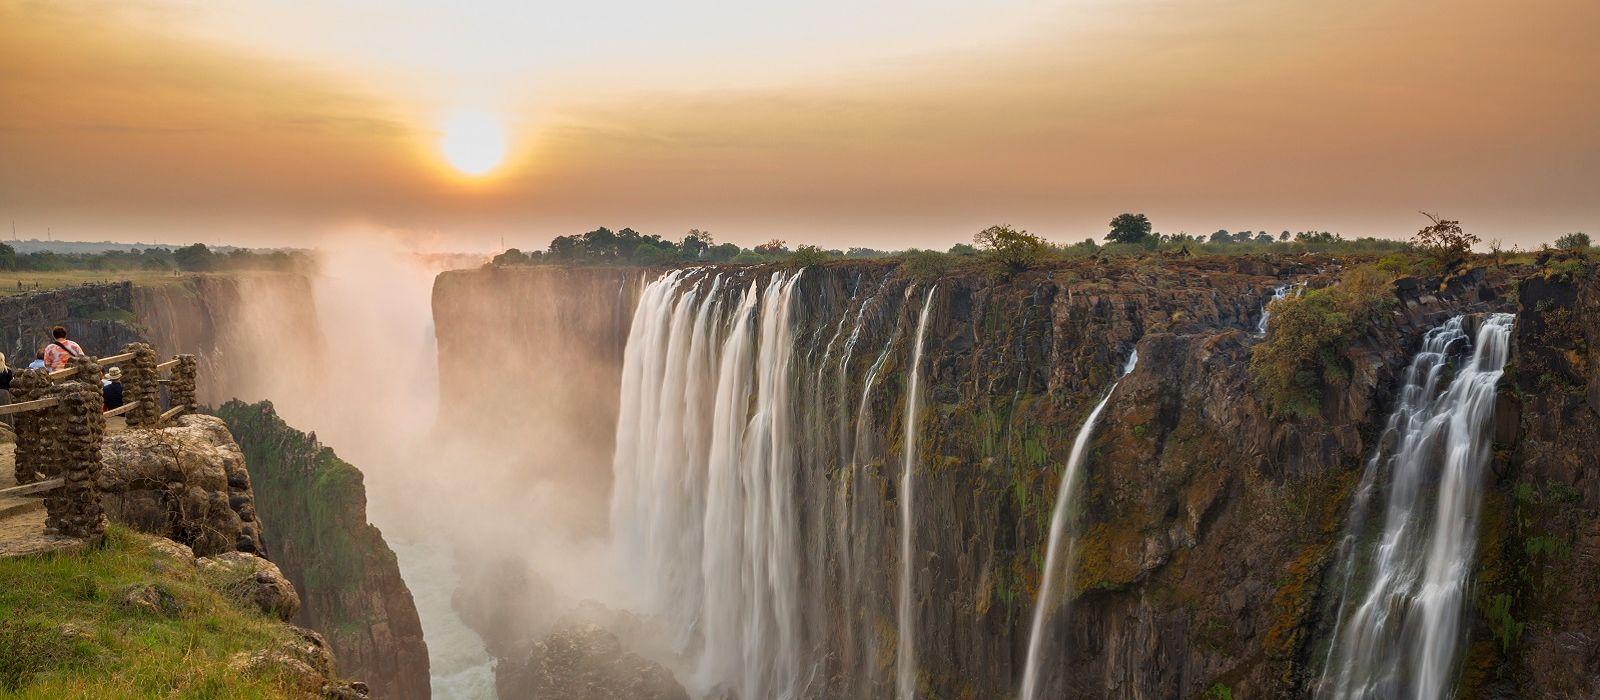 Machaba Safaris Special – Botswana and Zimbabwe Tour Trip 1